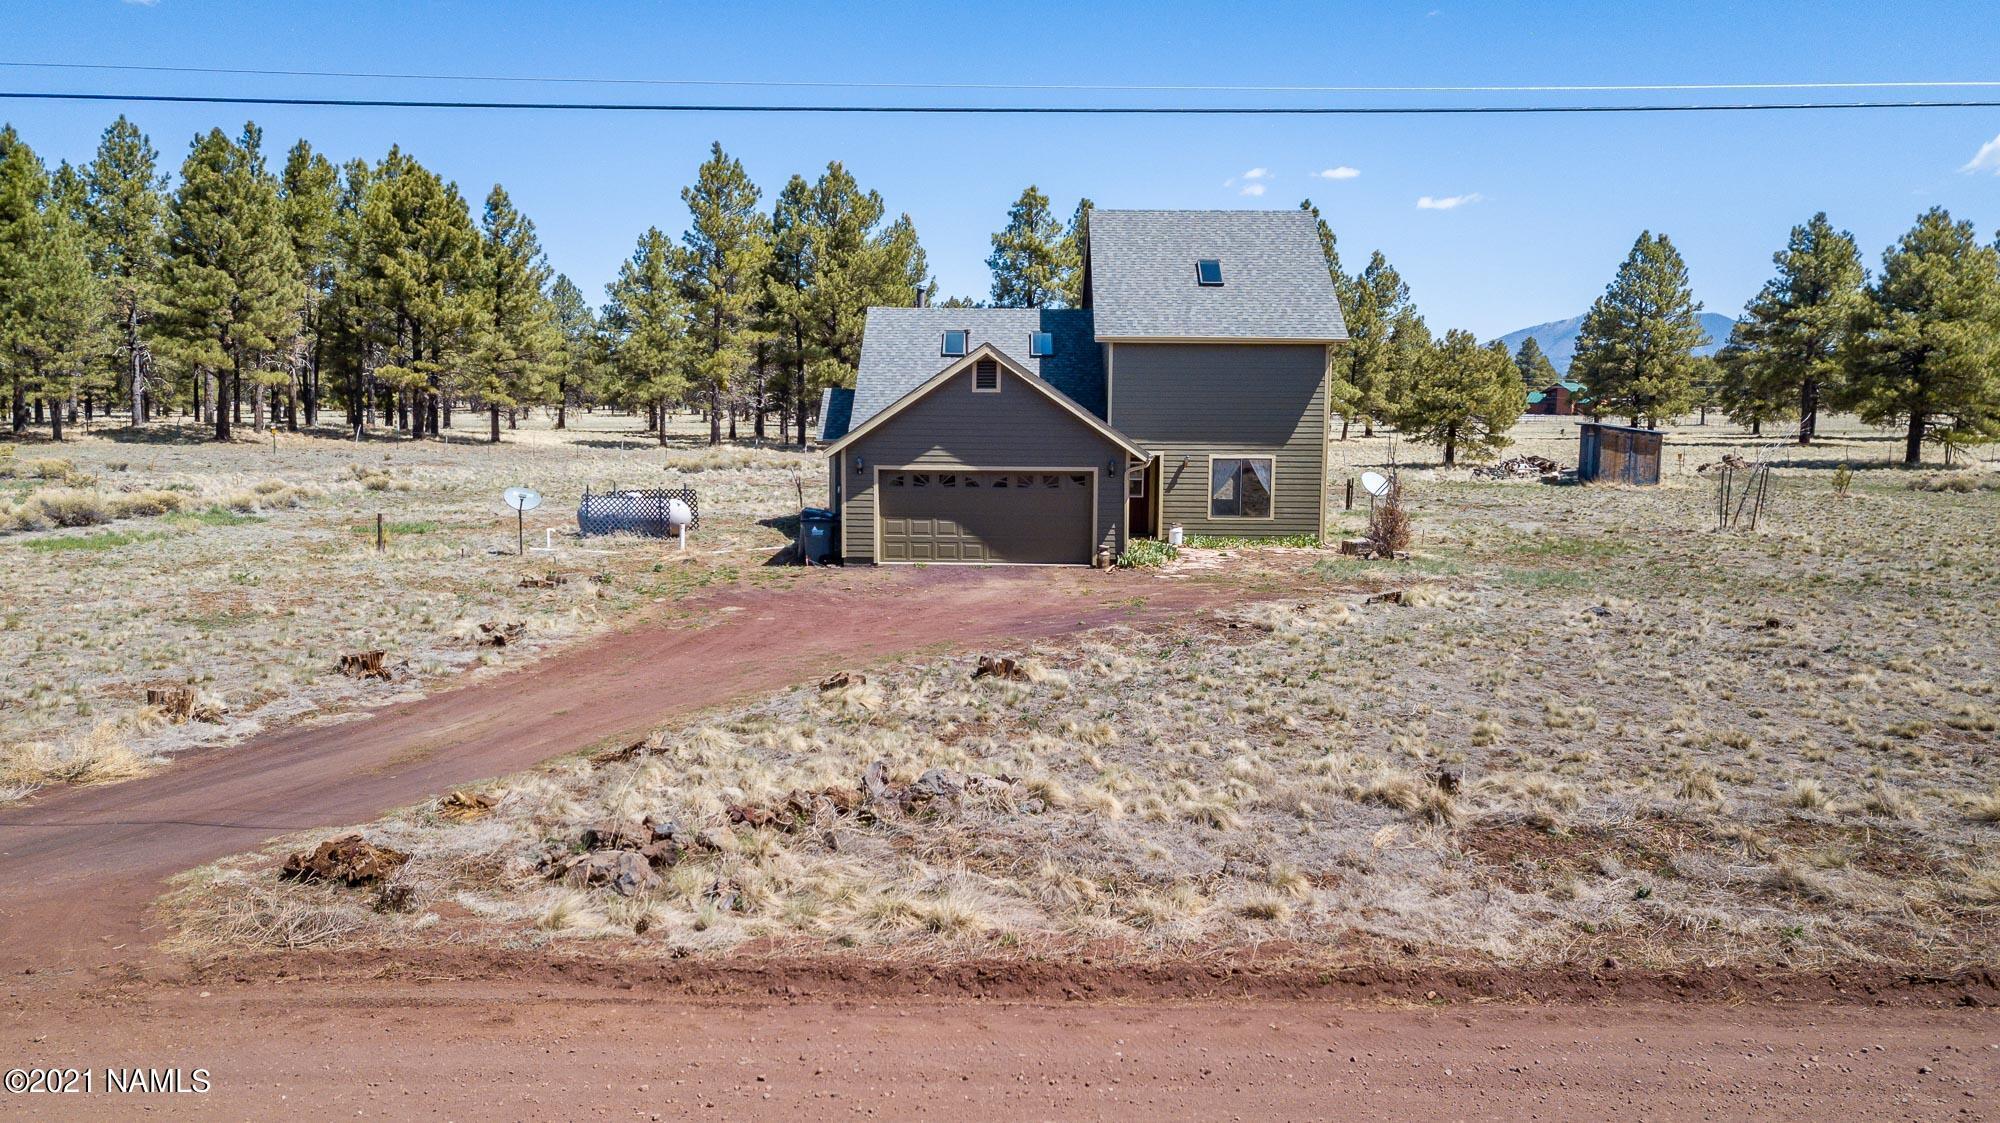 Photo of 13447 King John Road, Parks, AZ 86018